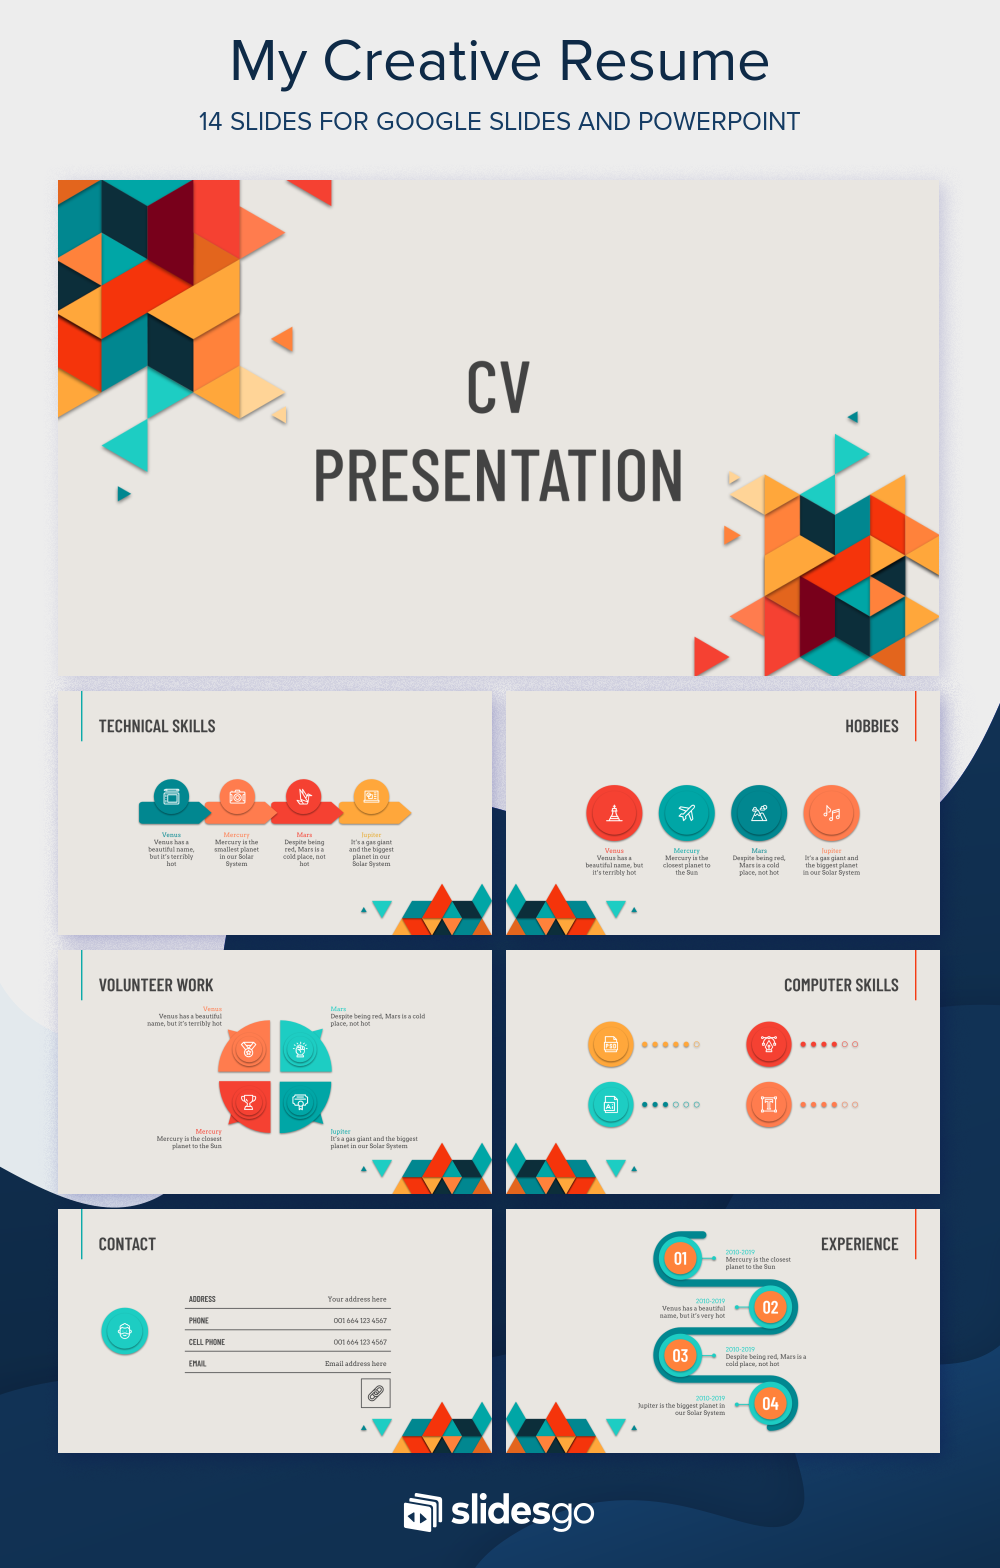 My Creative Resume Free Presentation Presentasi Desain Cv Gambar Kehidupan